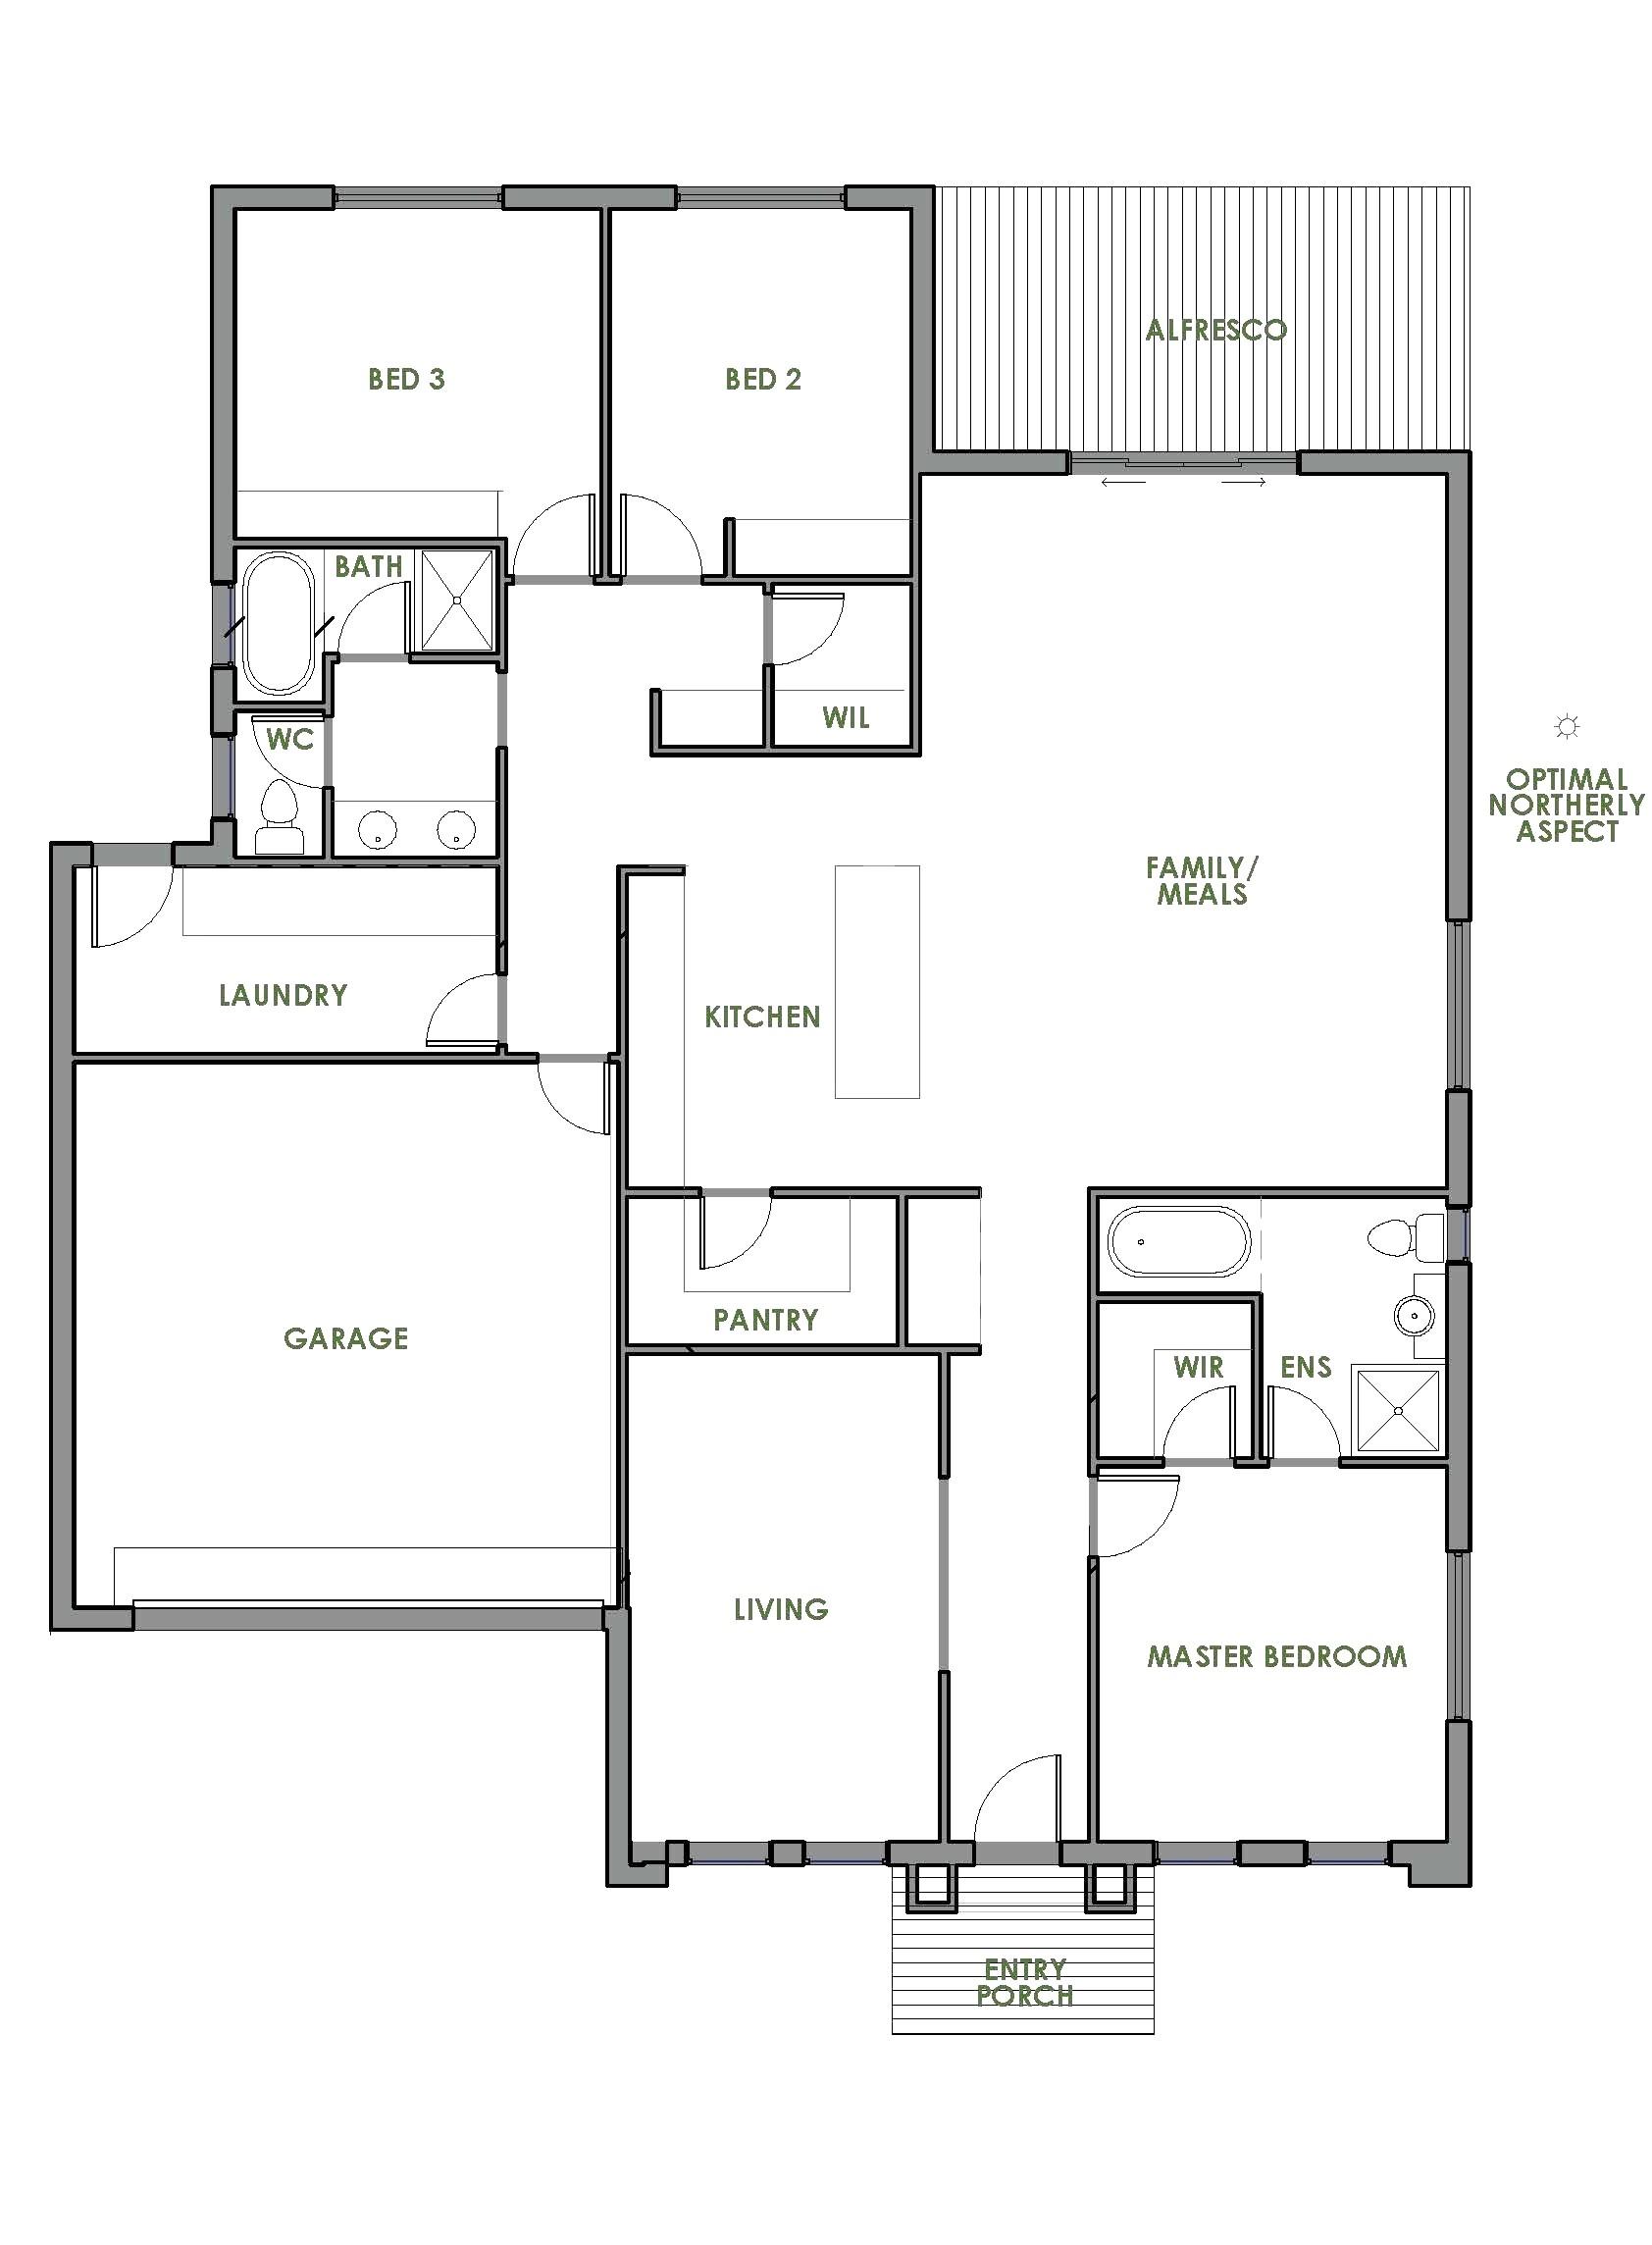 savvy homes floor plans elegant small homes plans lovely bedroom floor plan designer fanciful